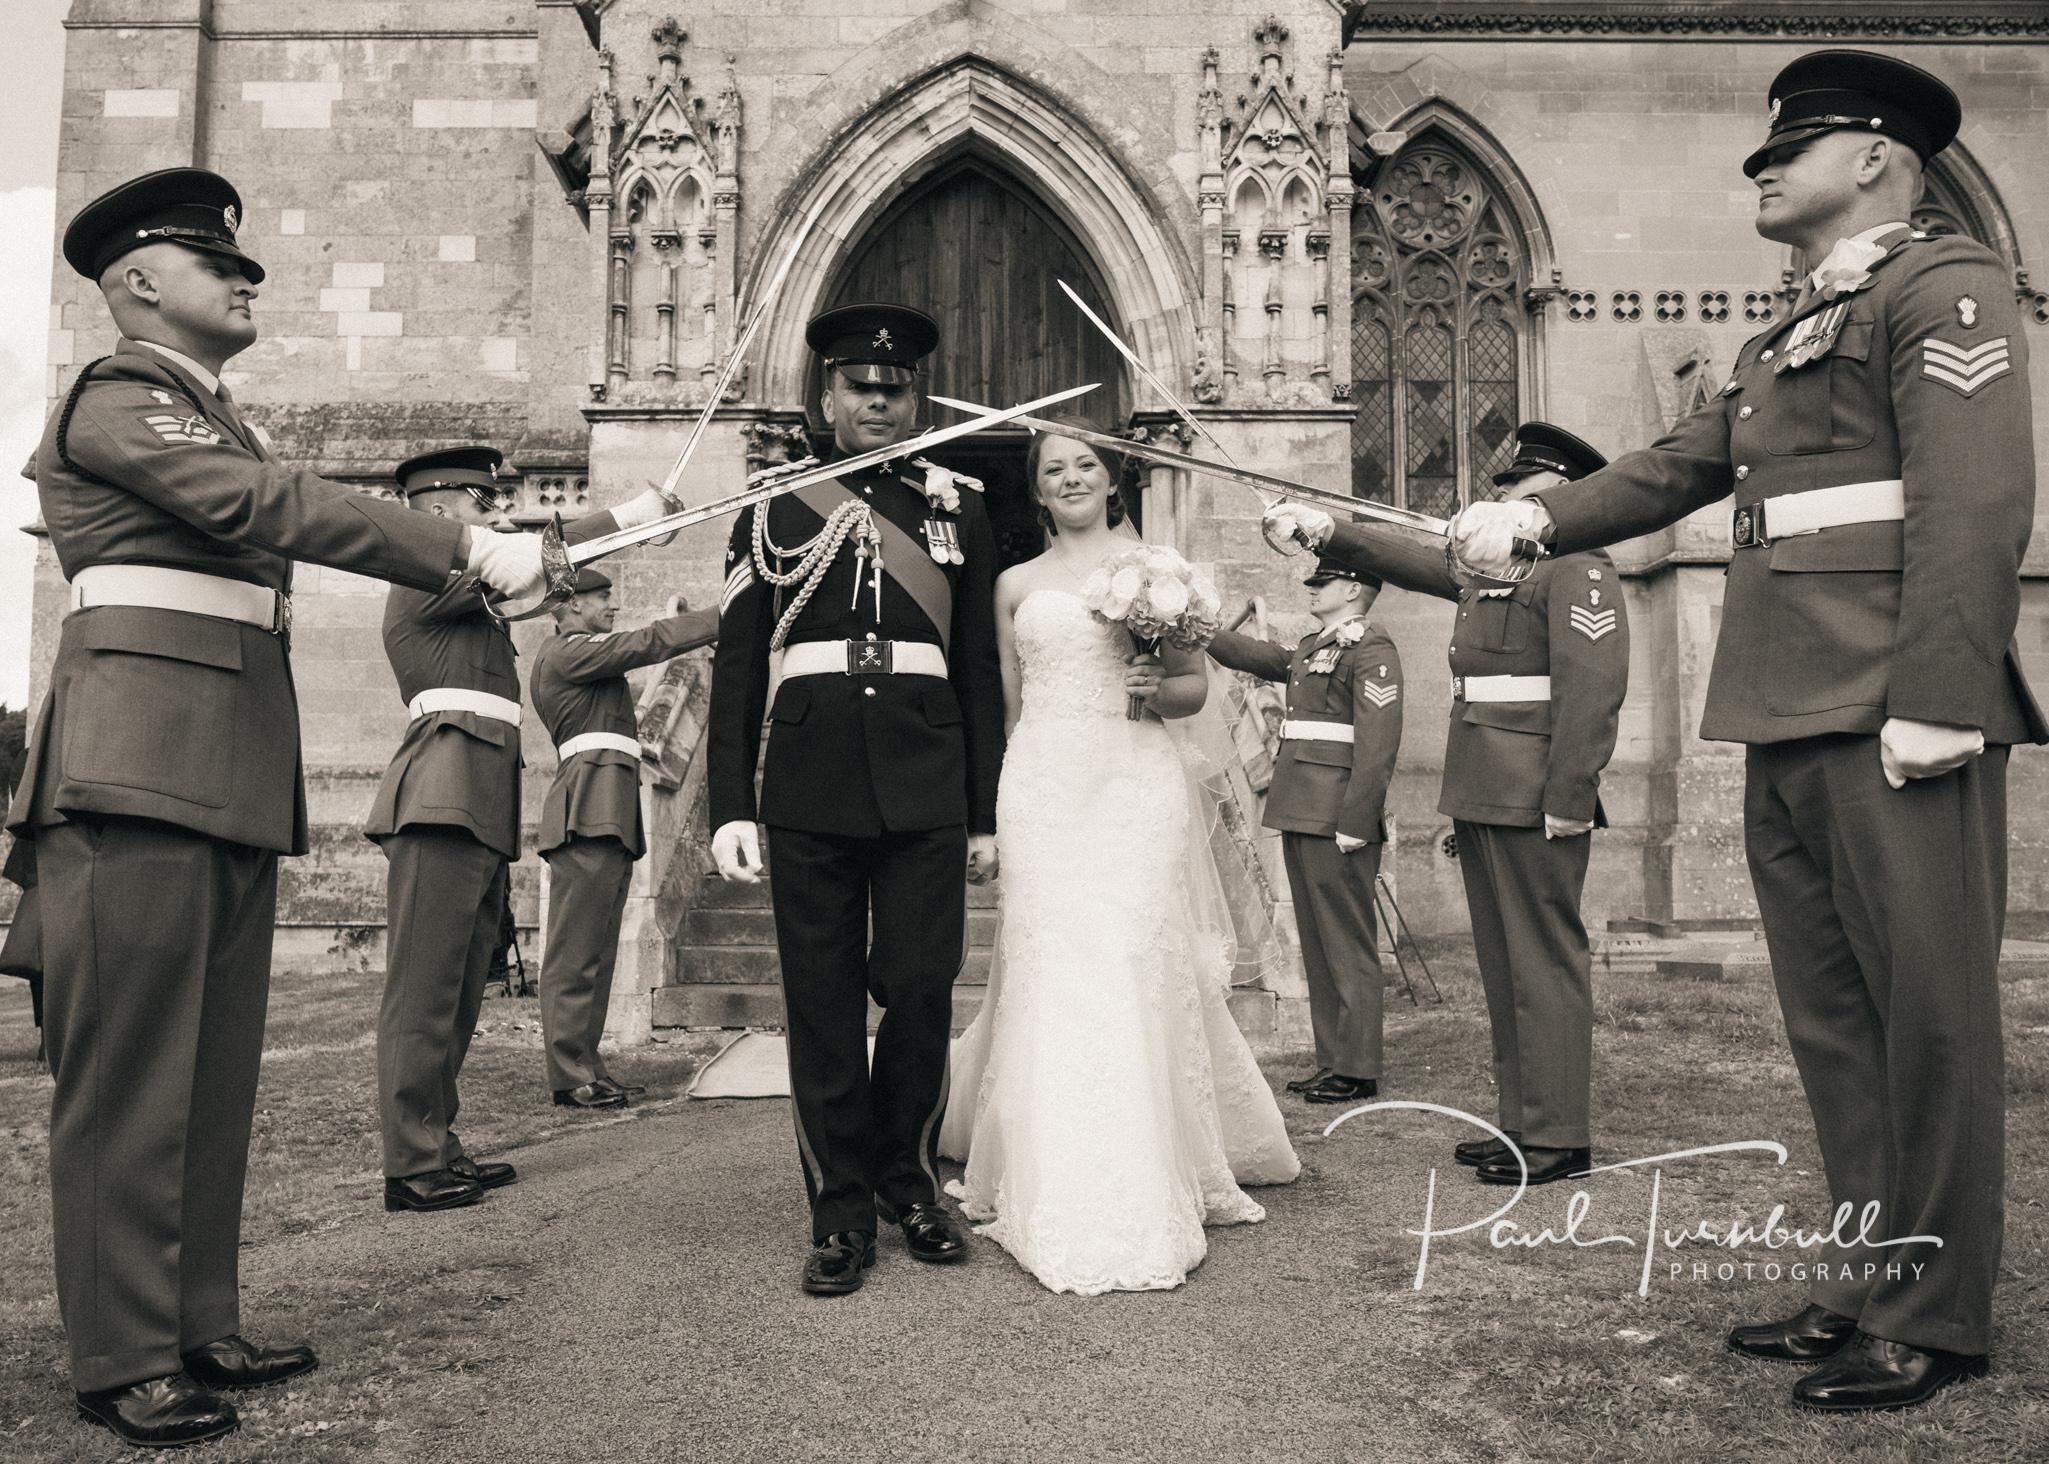 wedding-photographer-south-dalton-walkington-yorkshire-emma-james-038.jpg